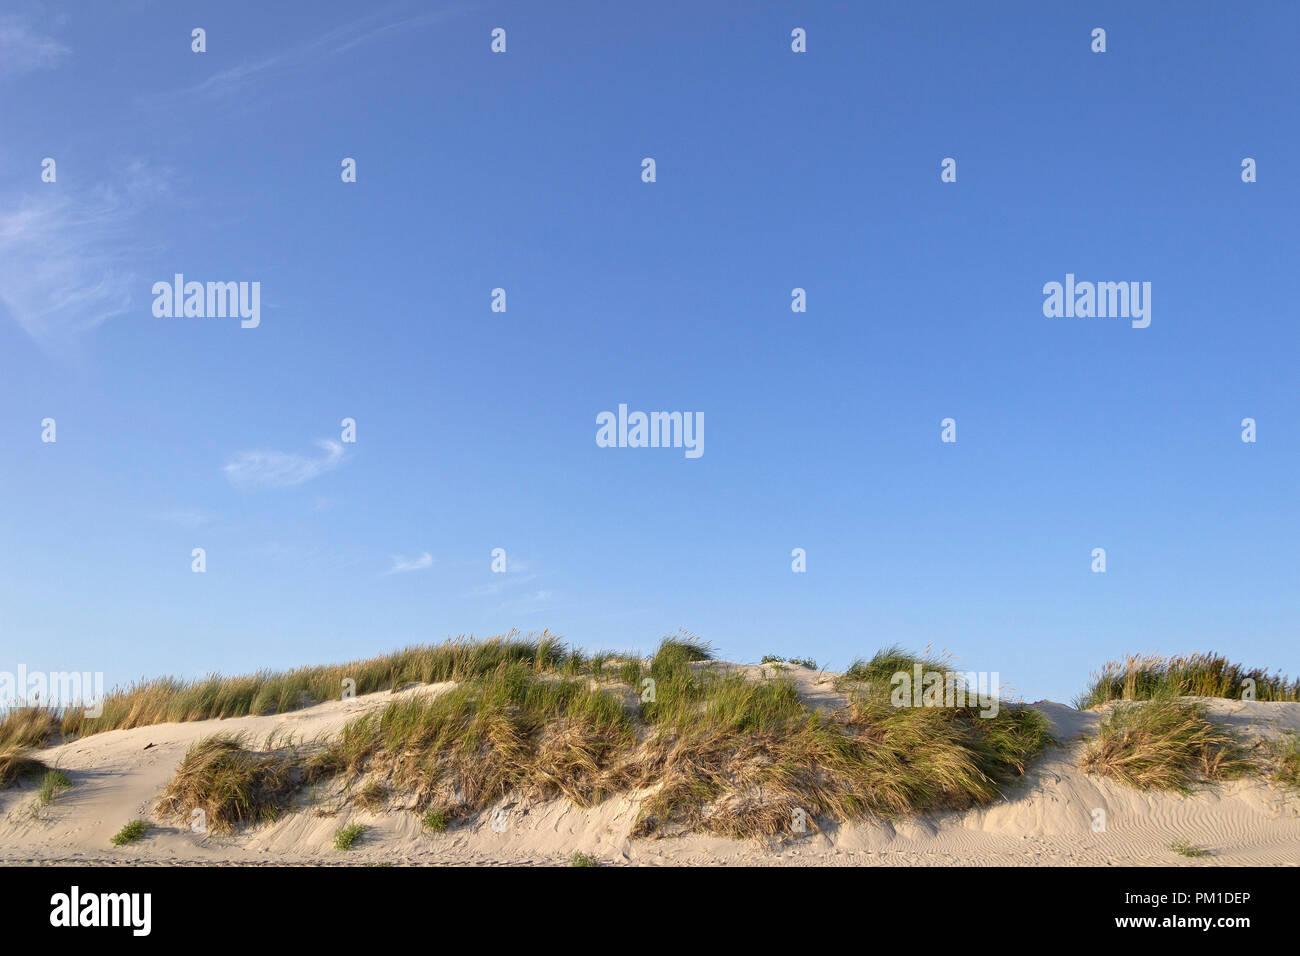 sand dunes, St. Peter-Ording, Schleswig-Holstein, Germany - Stock Image